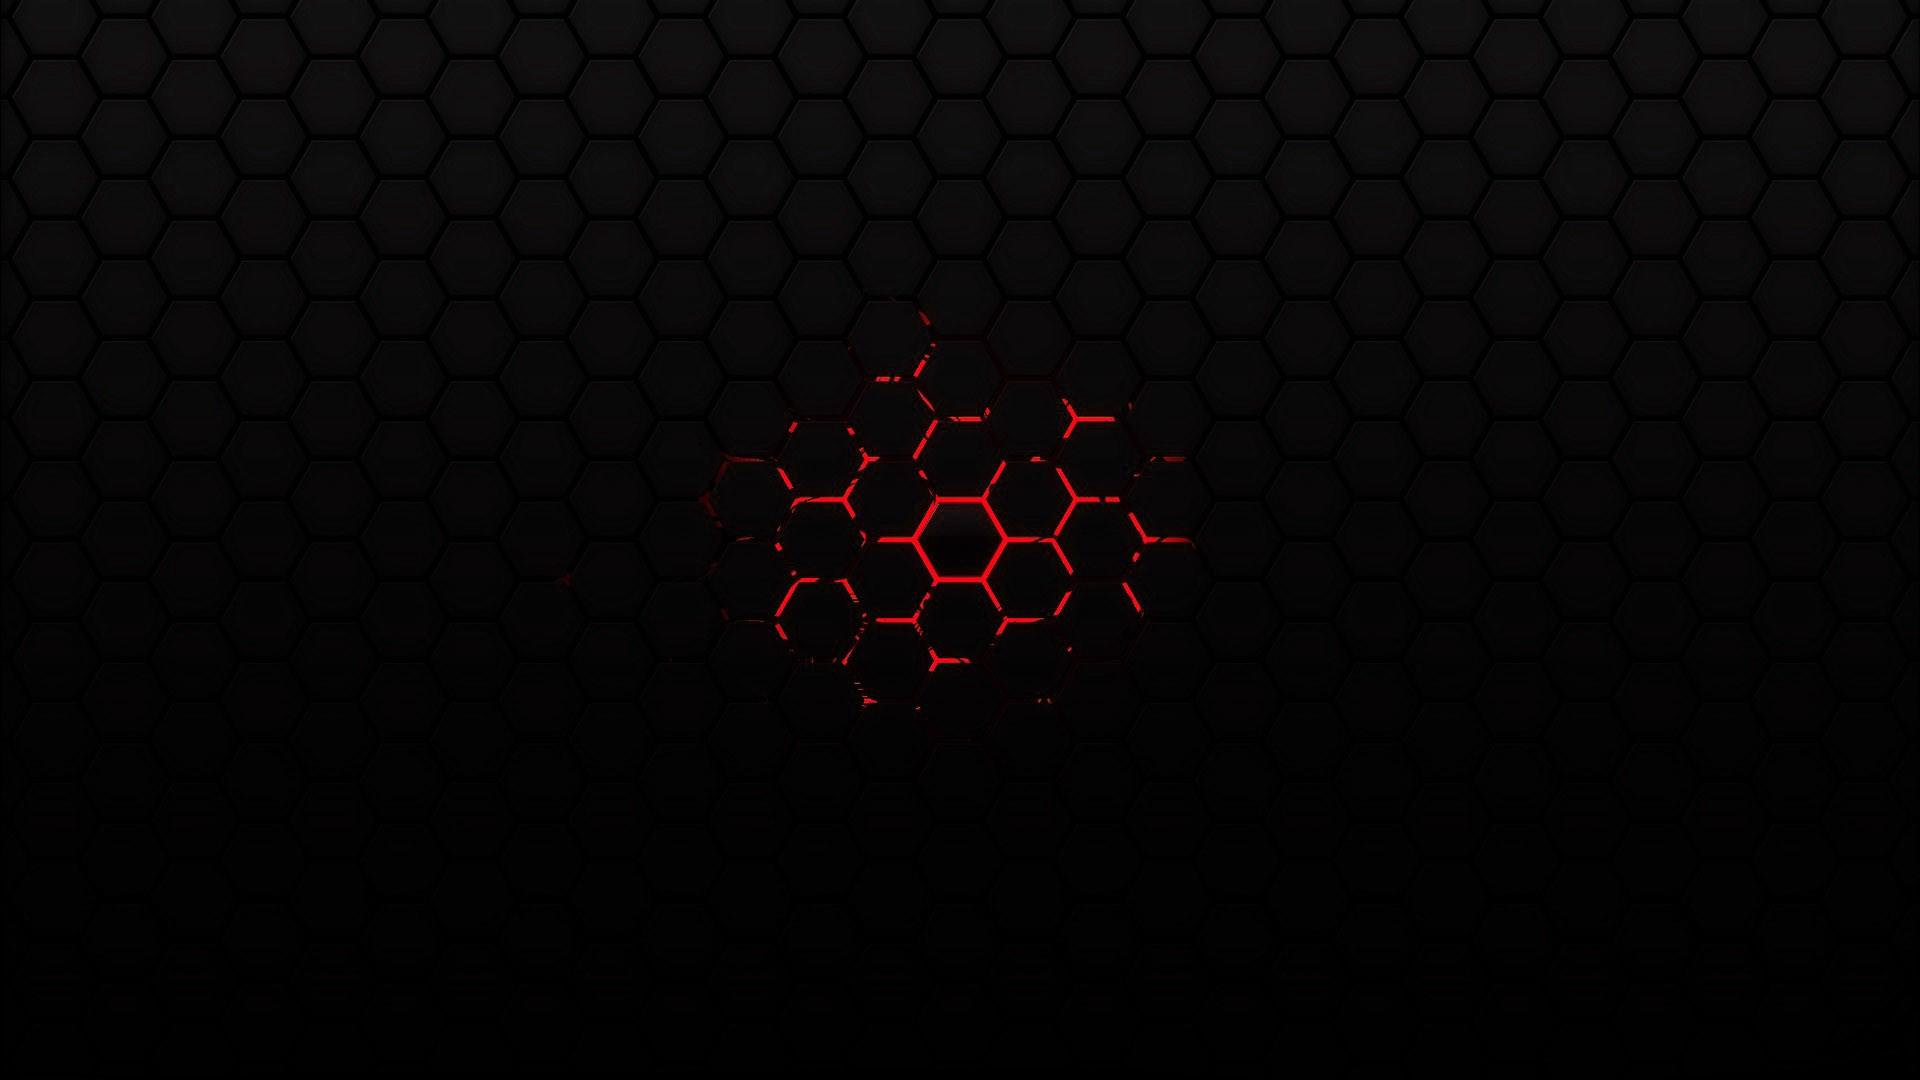 black red black background wallpaper background